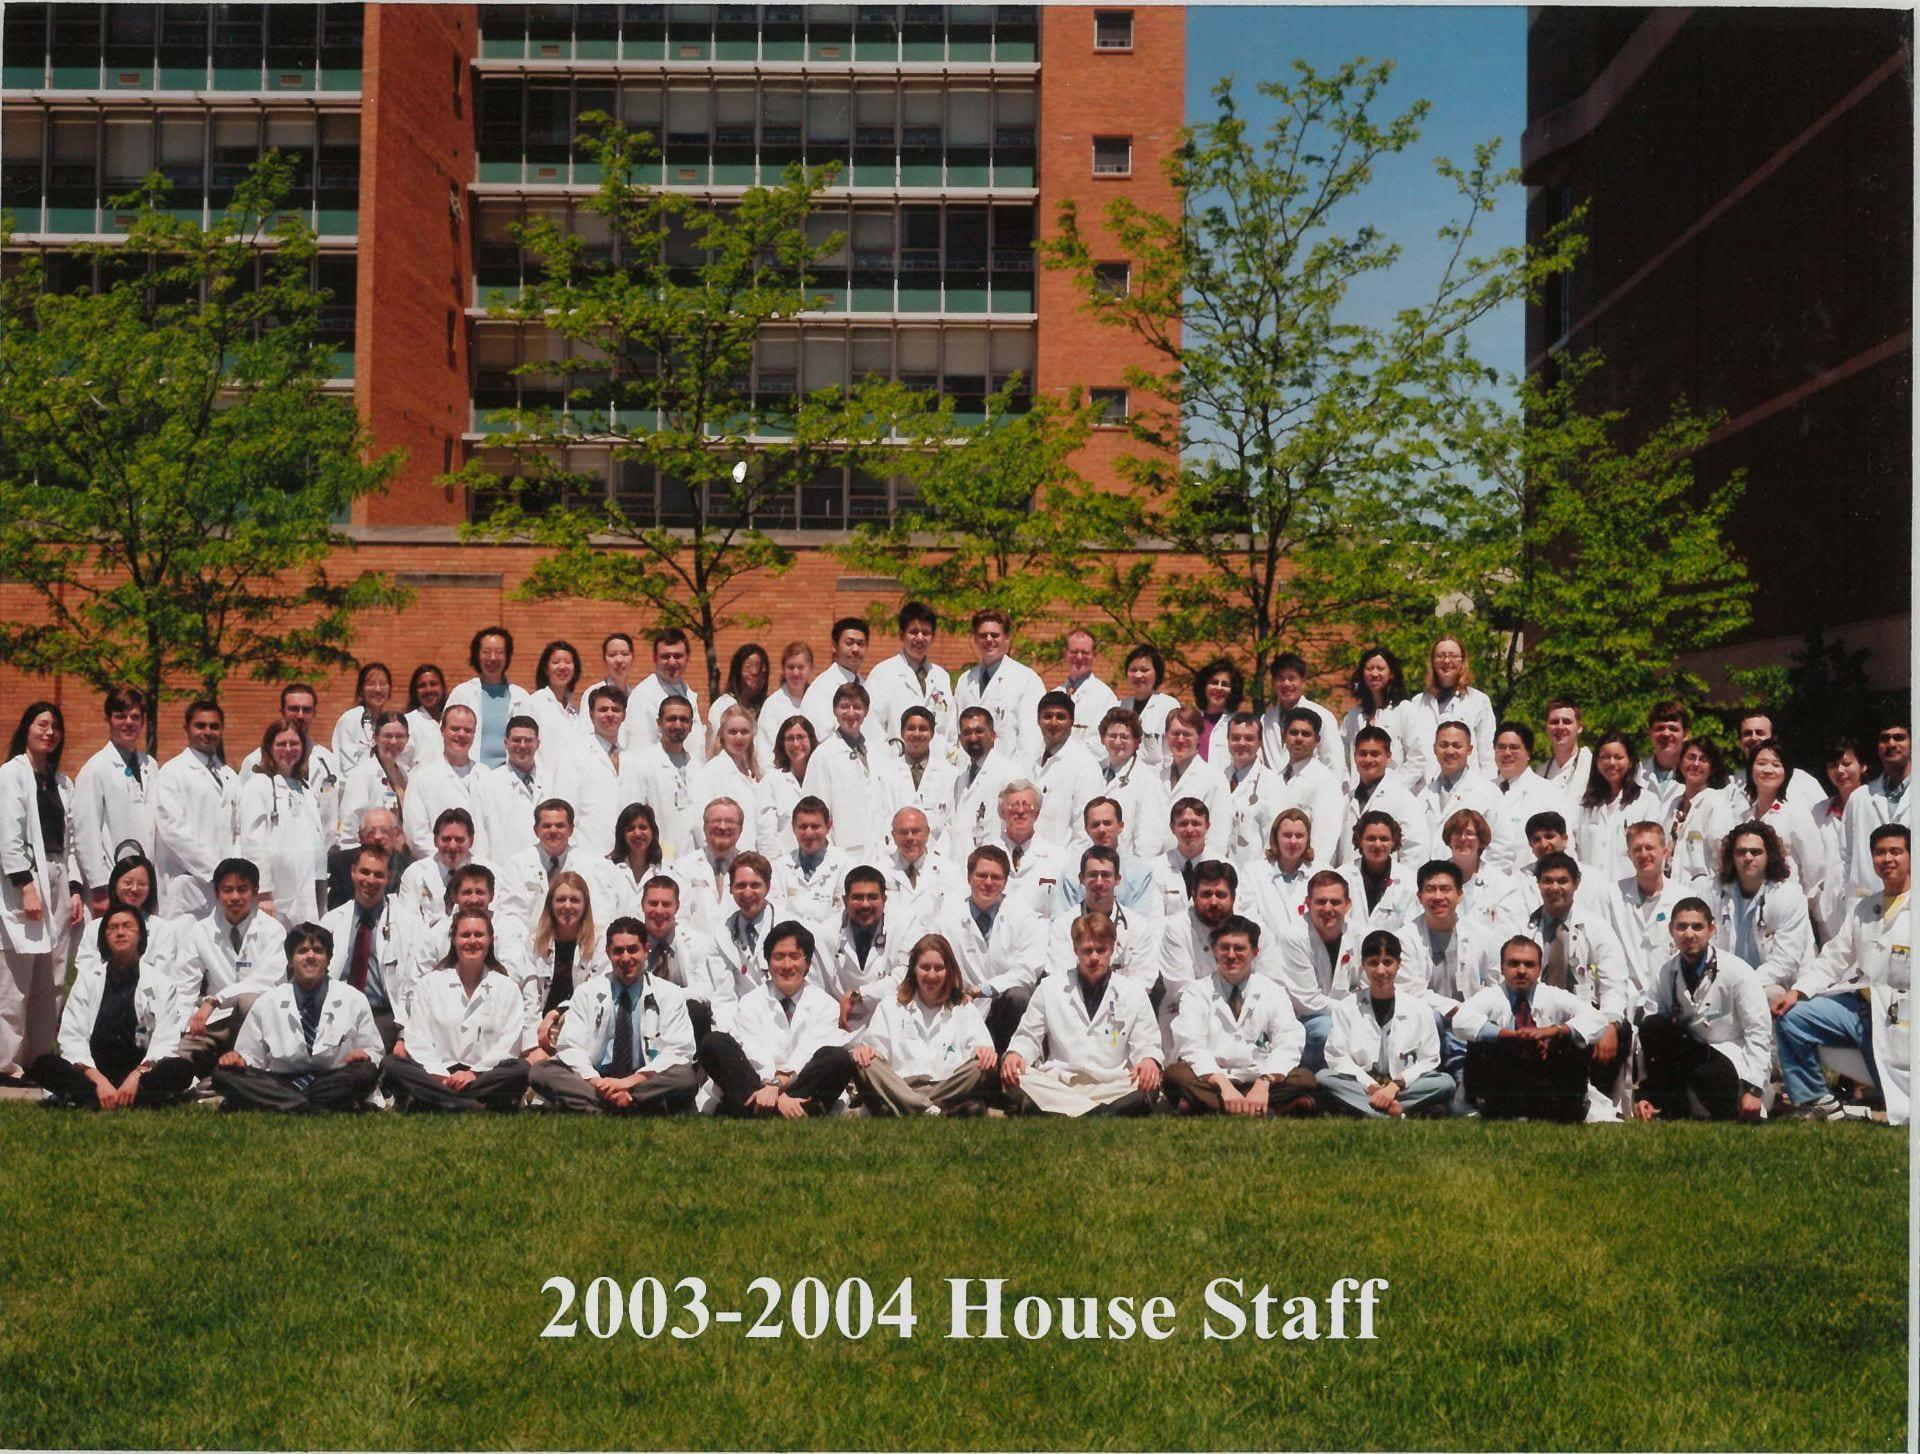 2003 Housestaff Photo